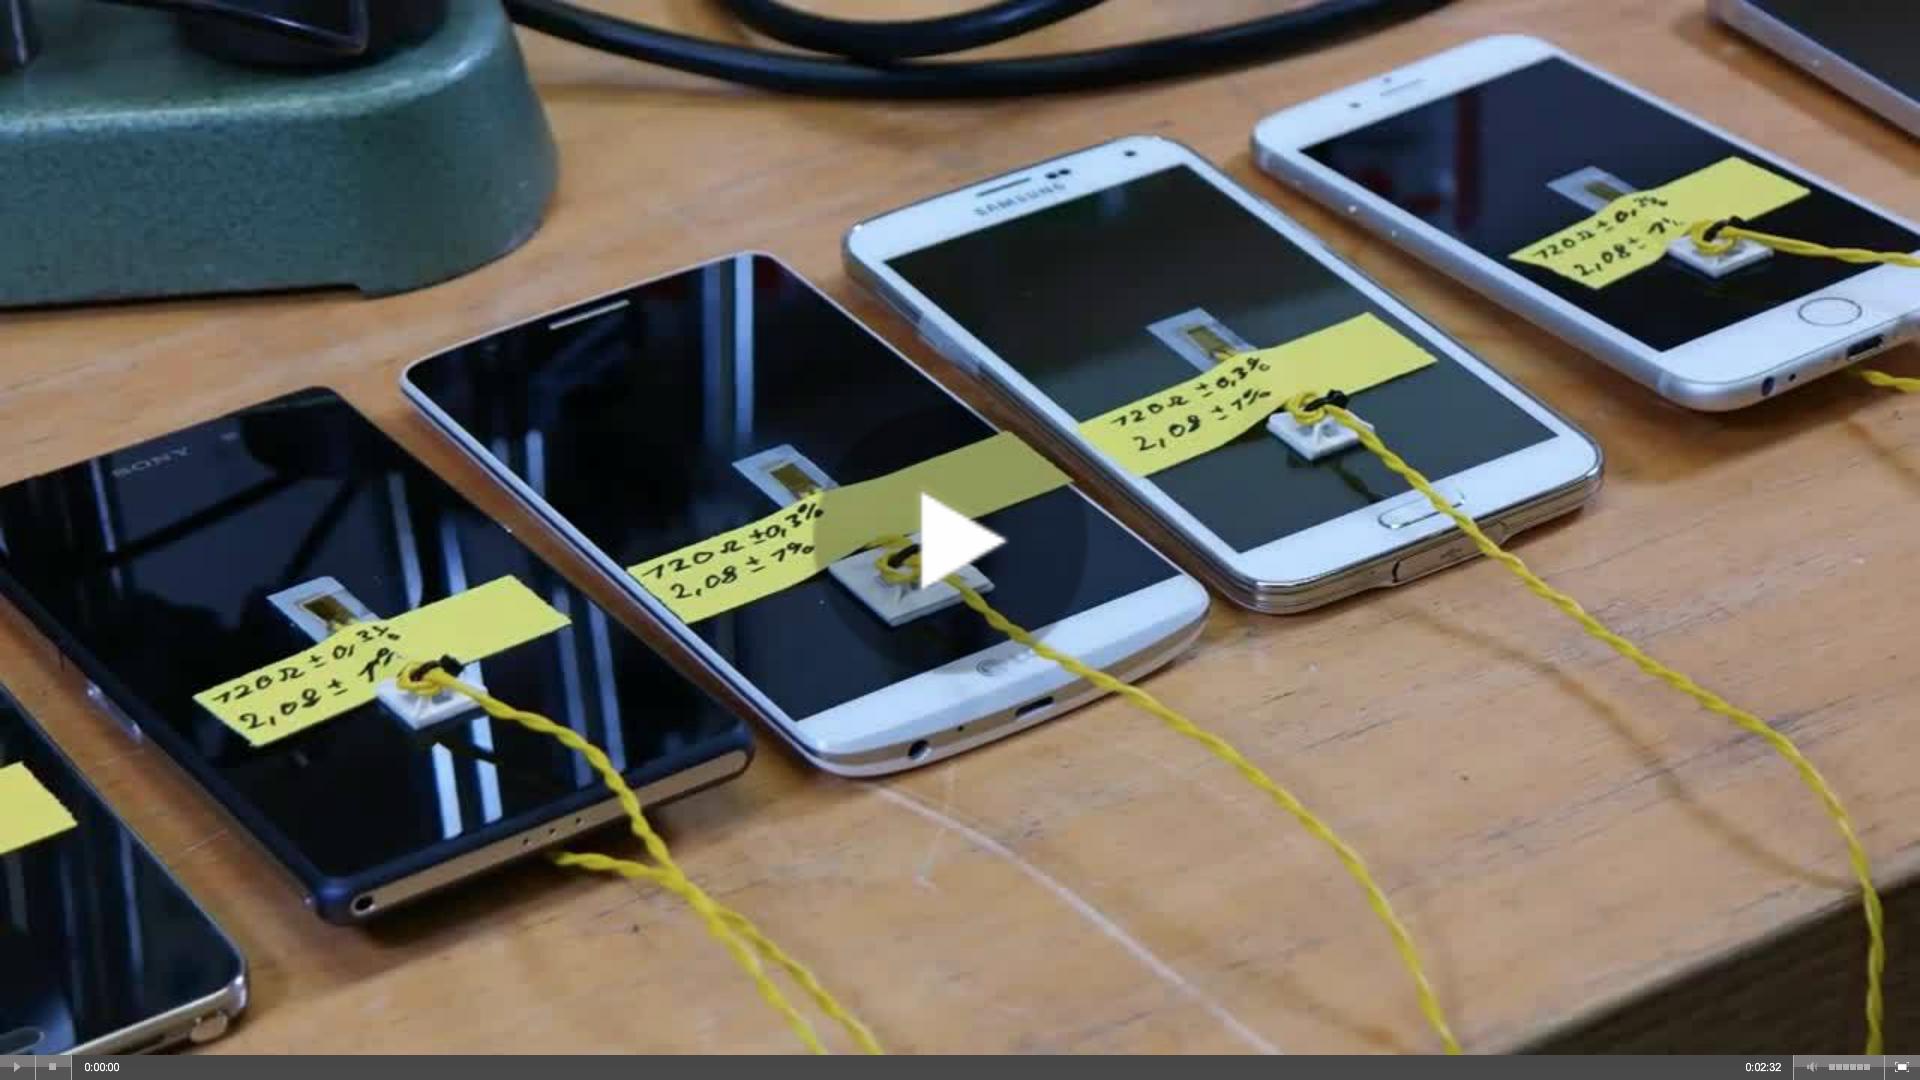 Stiftung warentest singlebörsen 2014 Εμπορικα καταστηματα θεσσαλονικης